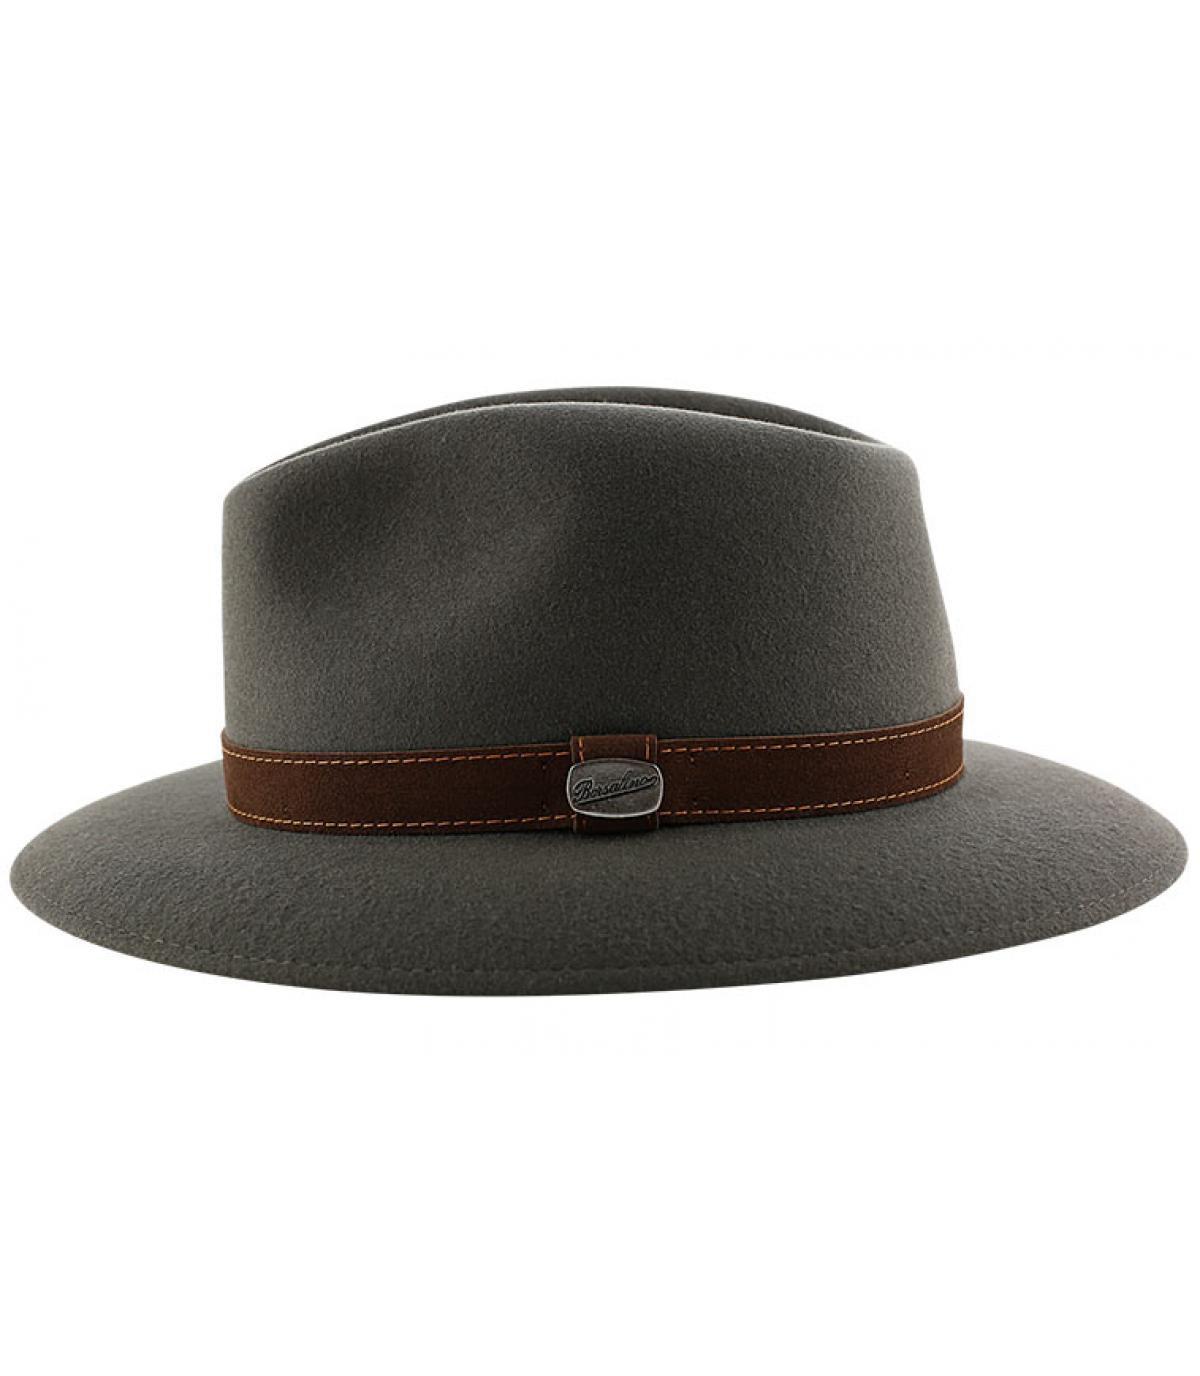 Details Alessandria grey fur felt hat - afbeeling 4